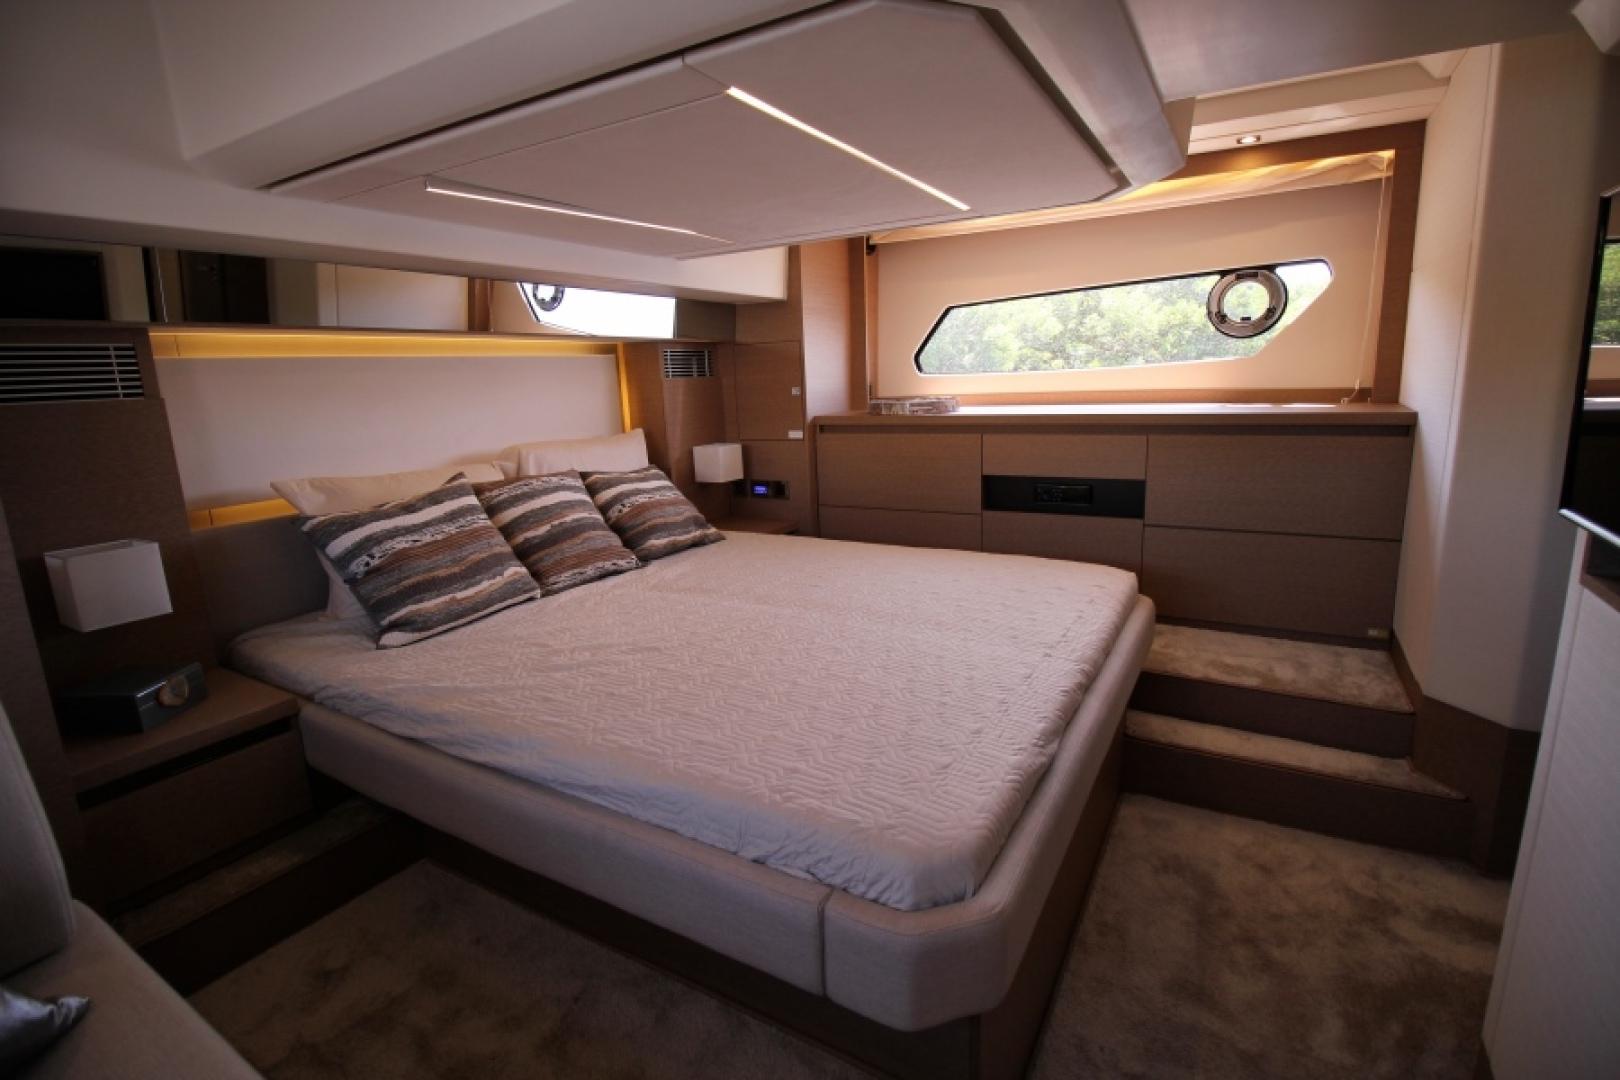 Prestige-460 S 2018-Unforgettable St Petersburg-Florida-United States-2018 Prestige 460 S Yacht  Unforgettable  Master Stateroom-1444272   Thumbnail